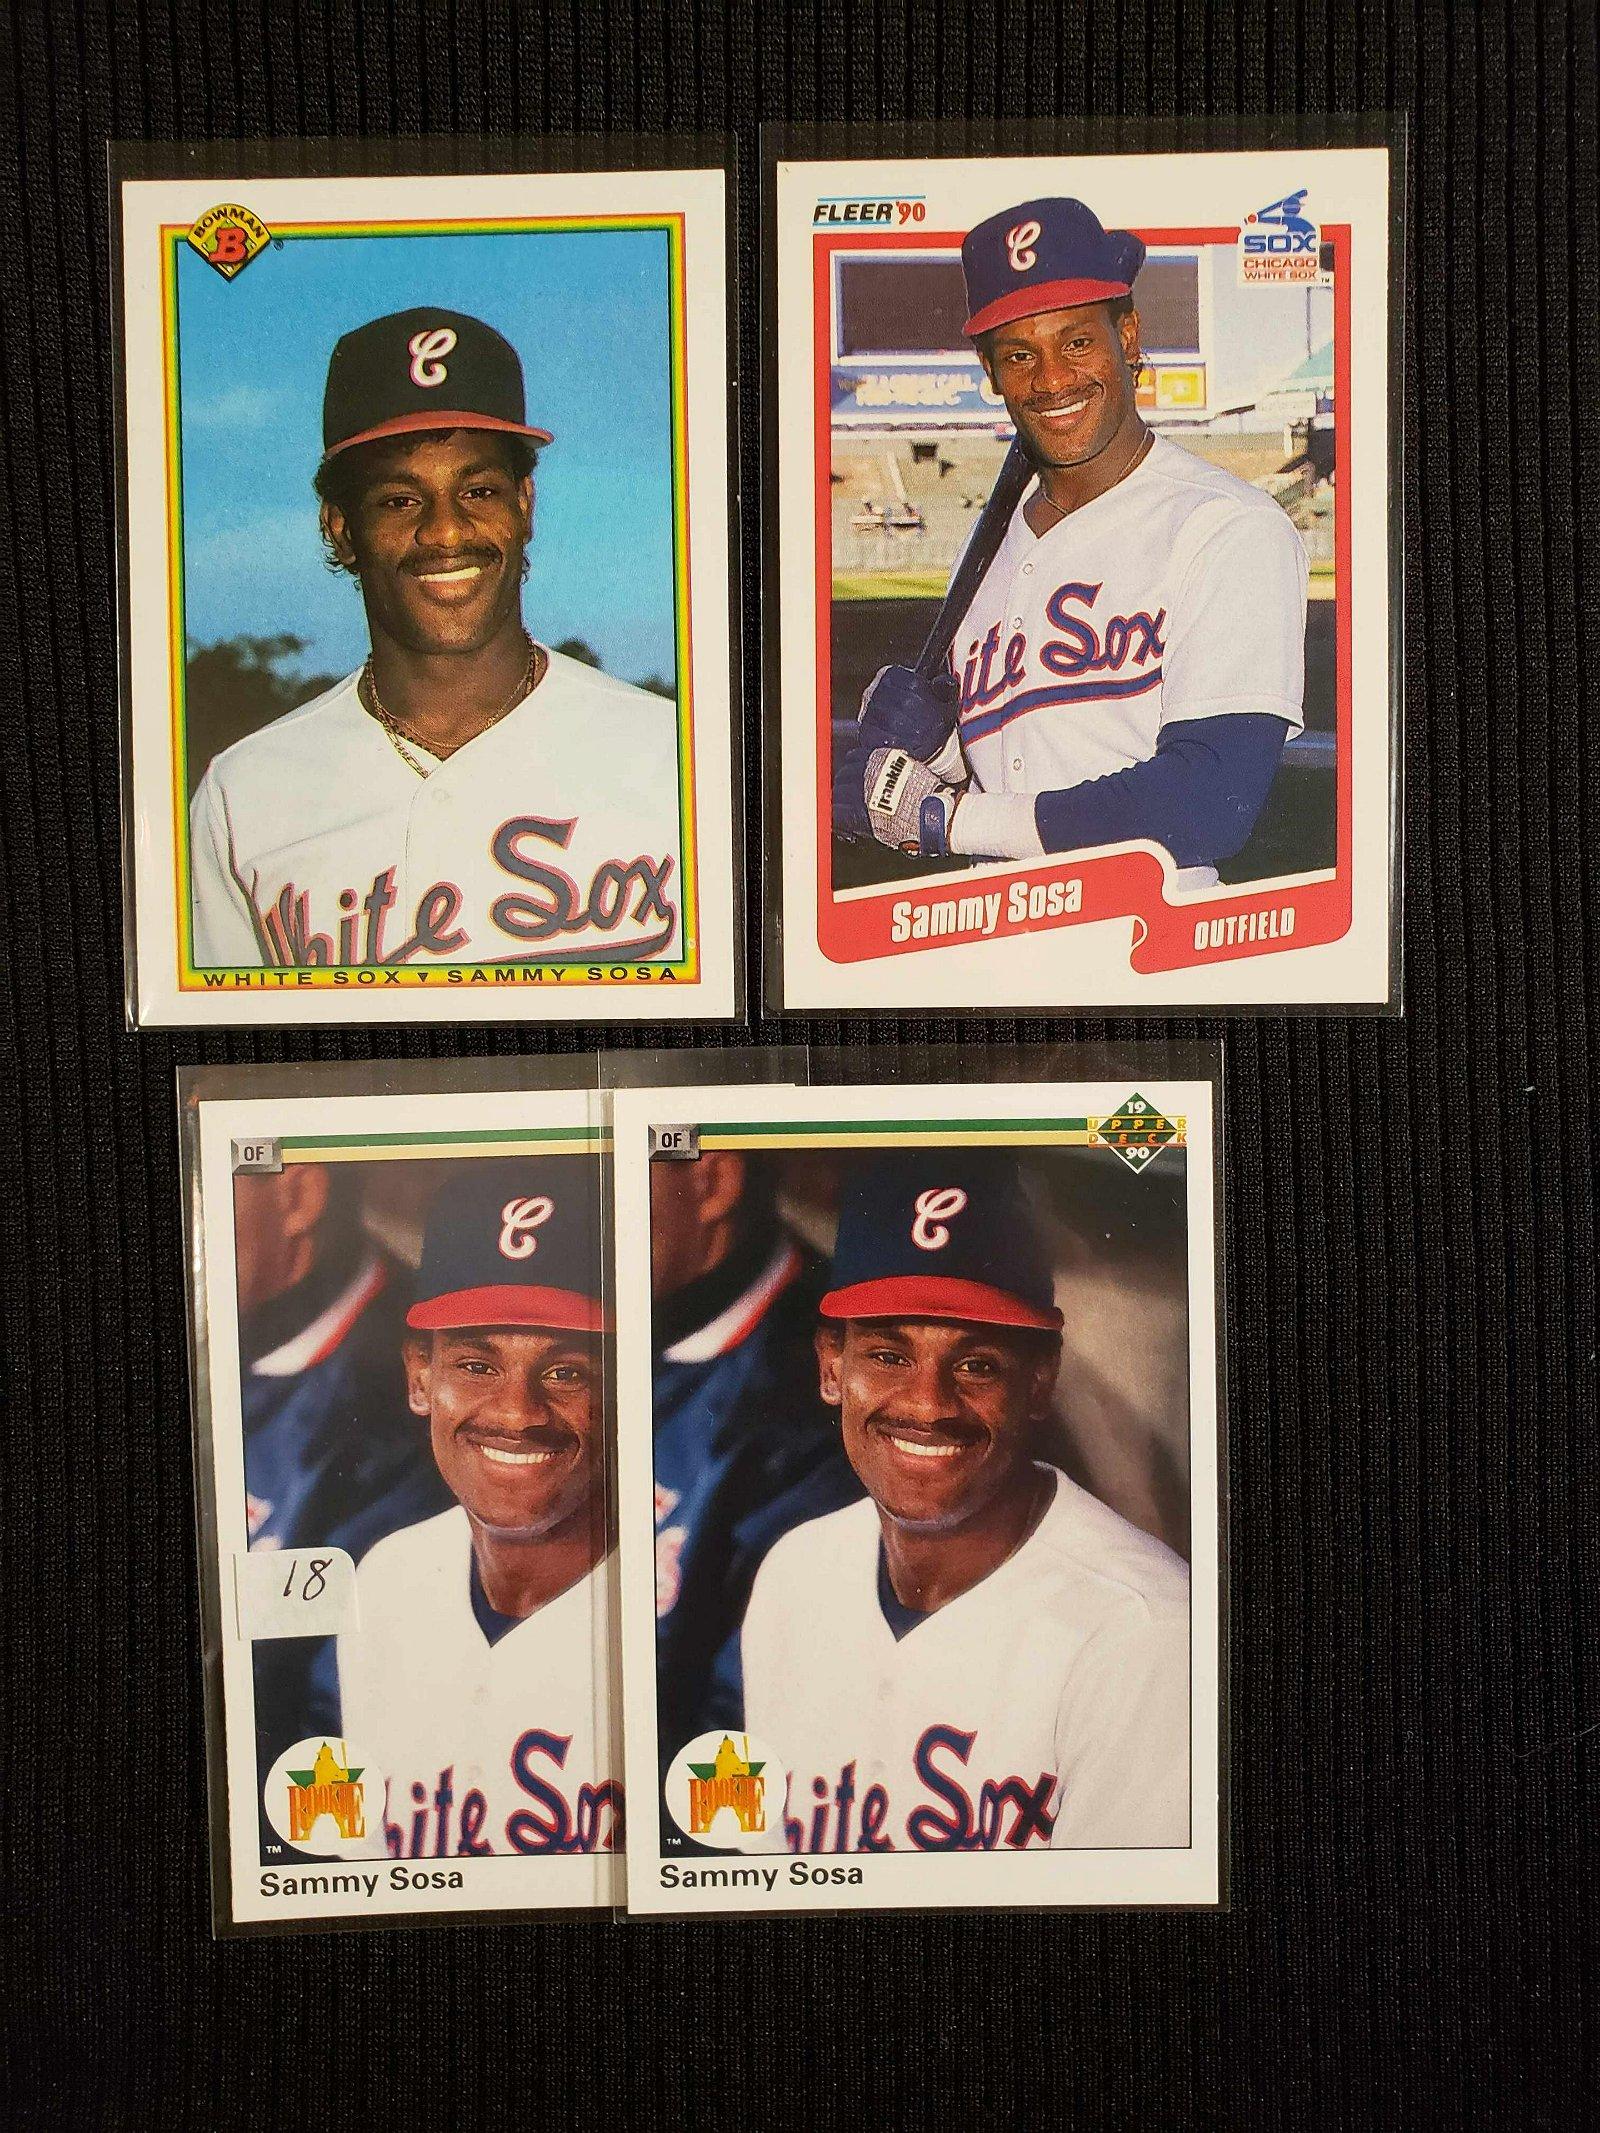 SAMMY SOSA CHICAGO BUBS ROOKIE CARDS